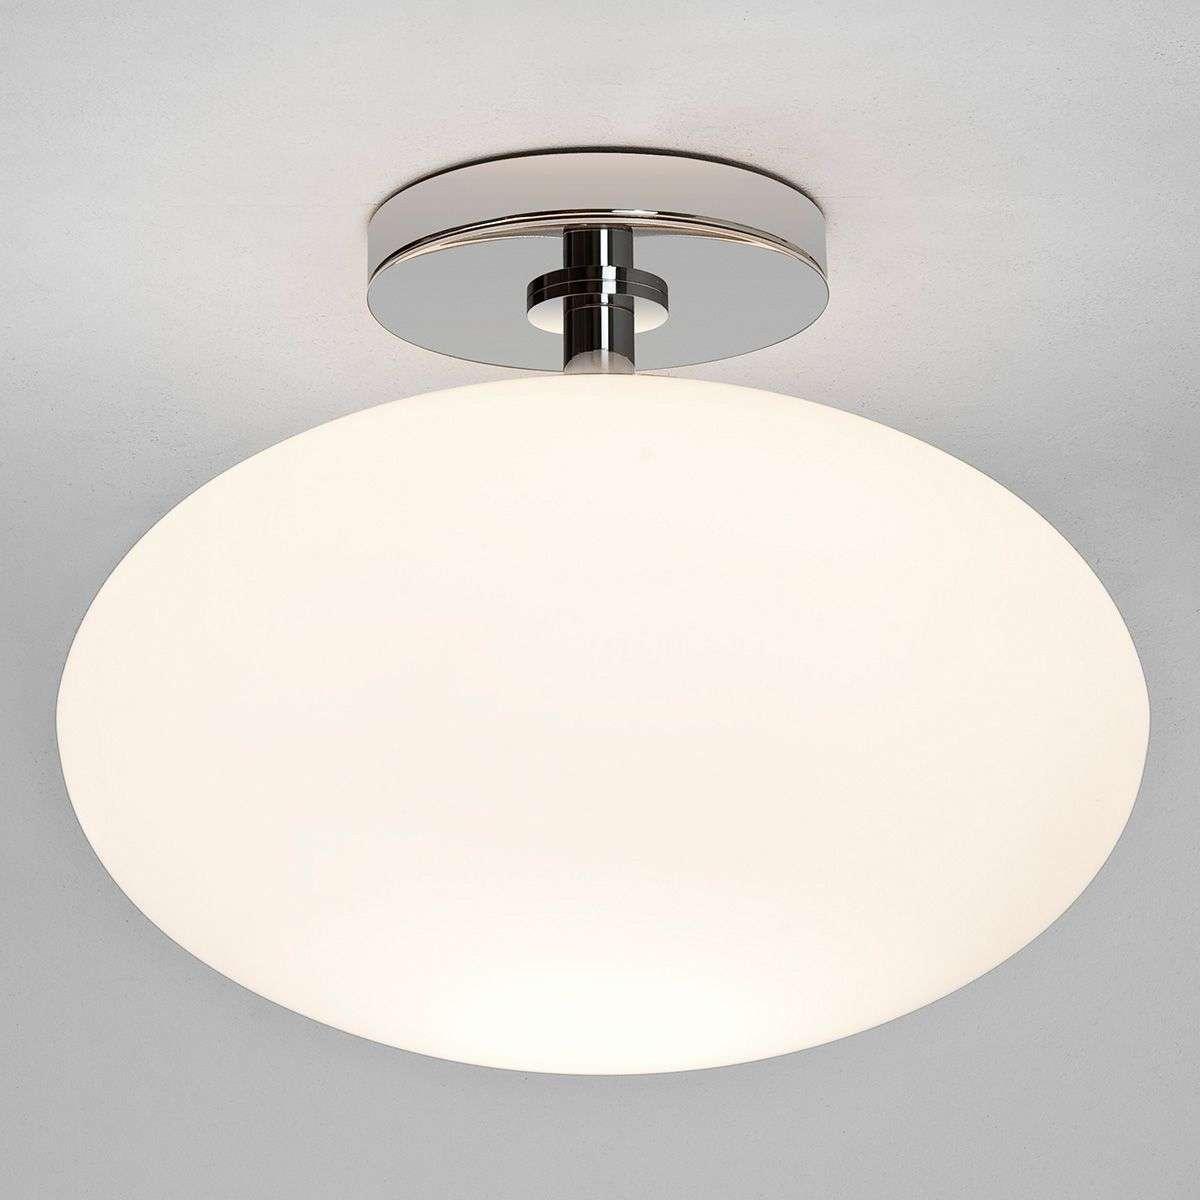 Zeppo Bathroom Ceiling Light Oval IP44-1020303-32